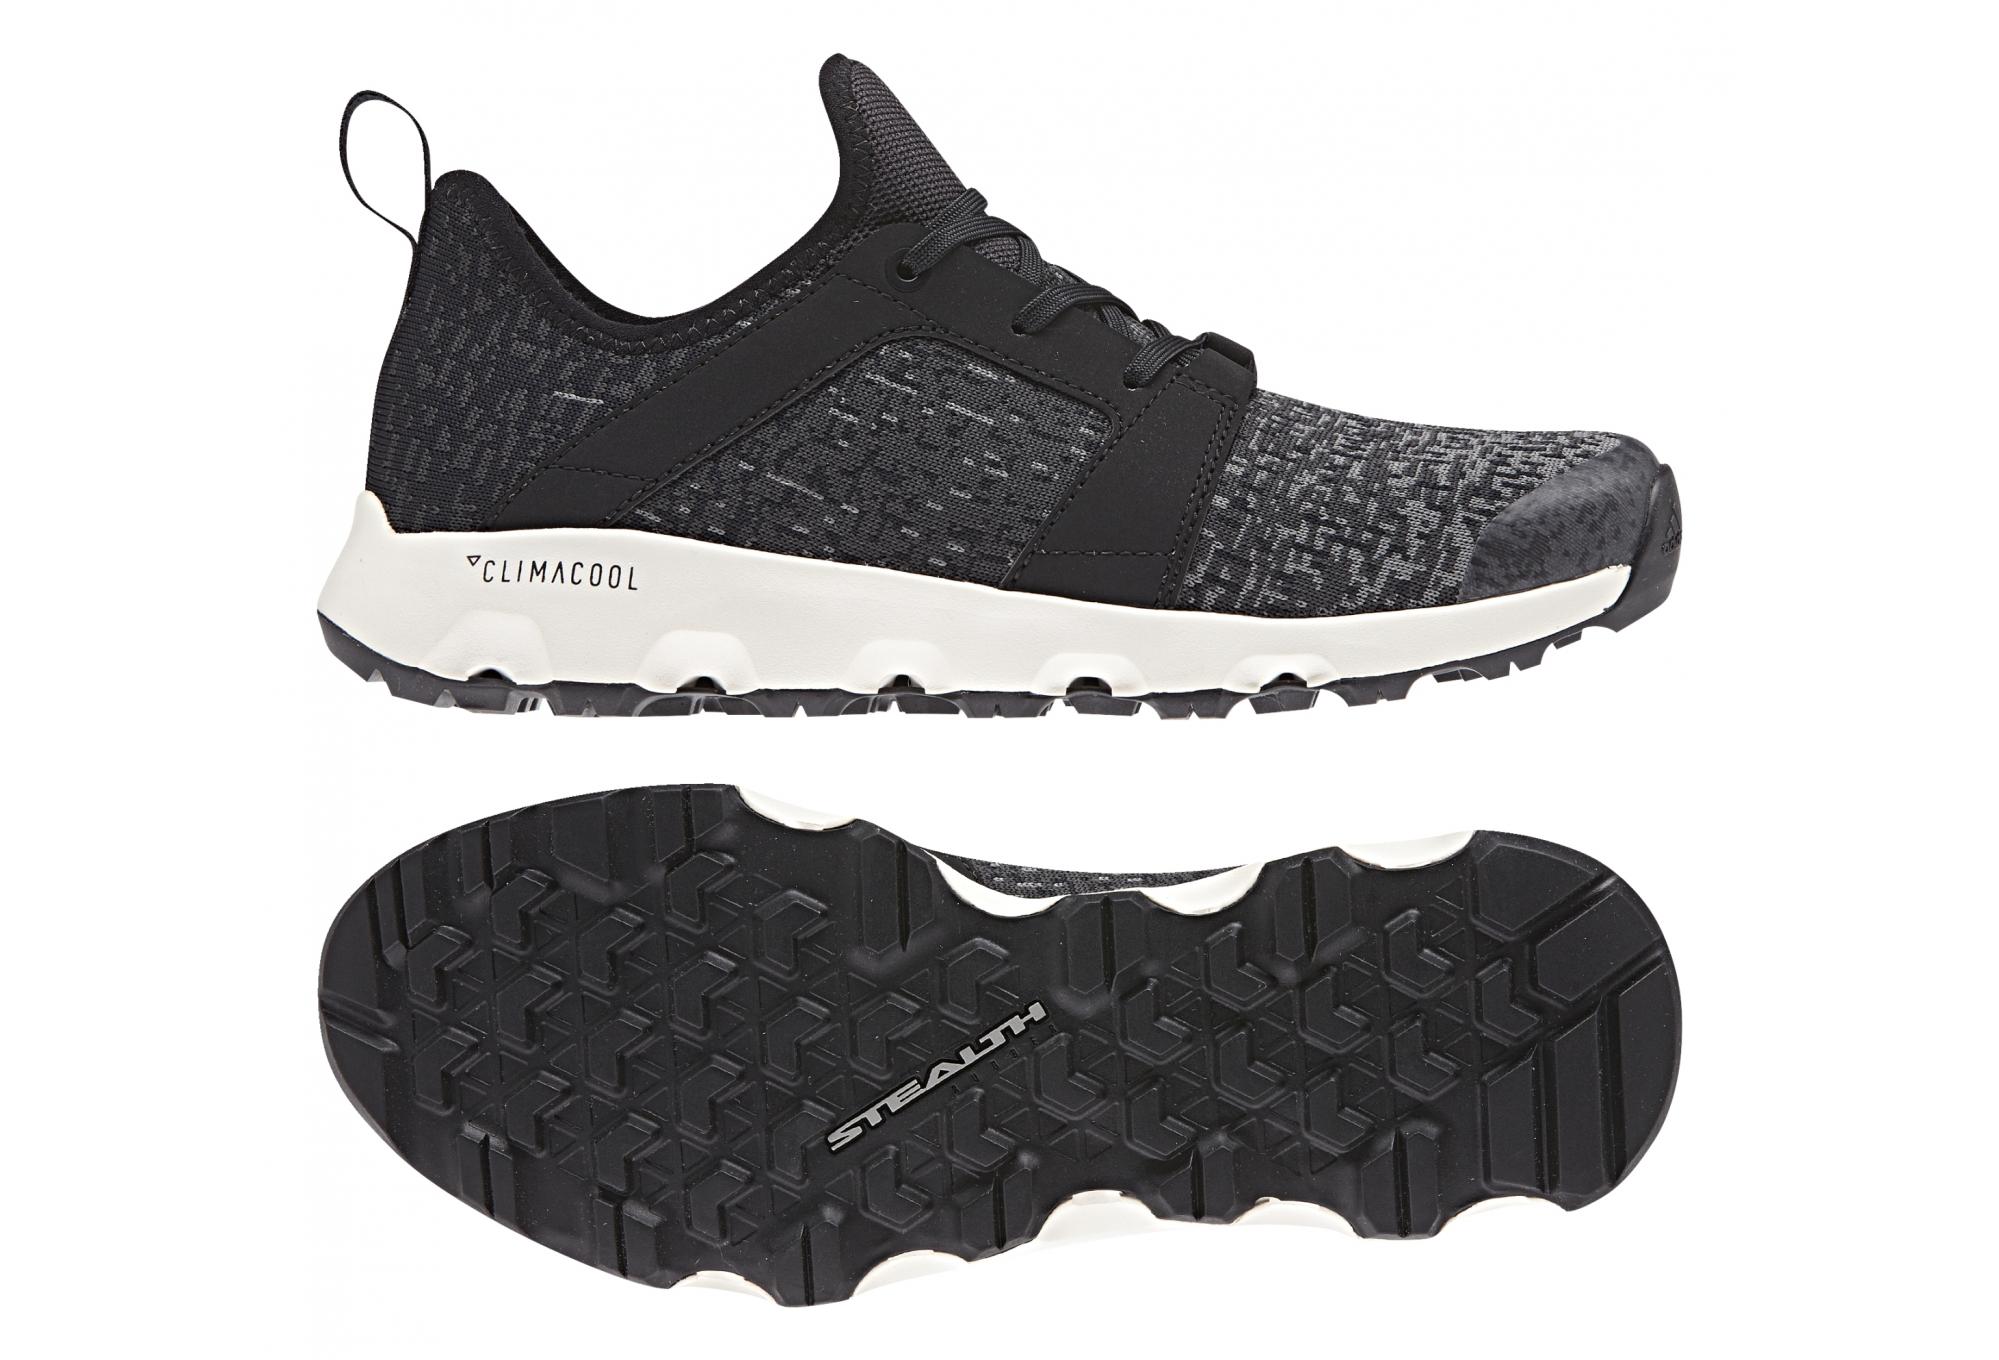 pretty nice 497d9 de2ea Chaussures femme adidas Terrex Climacool Voyager Sleek Parley